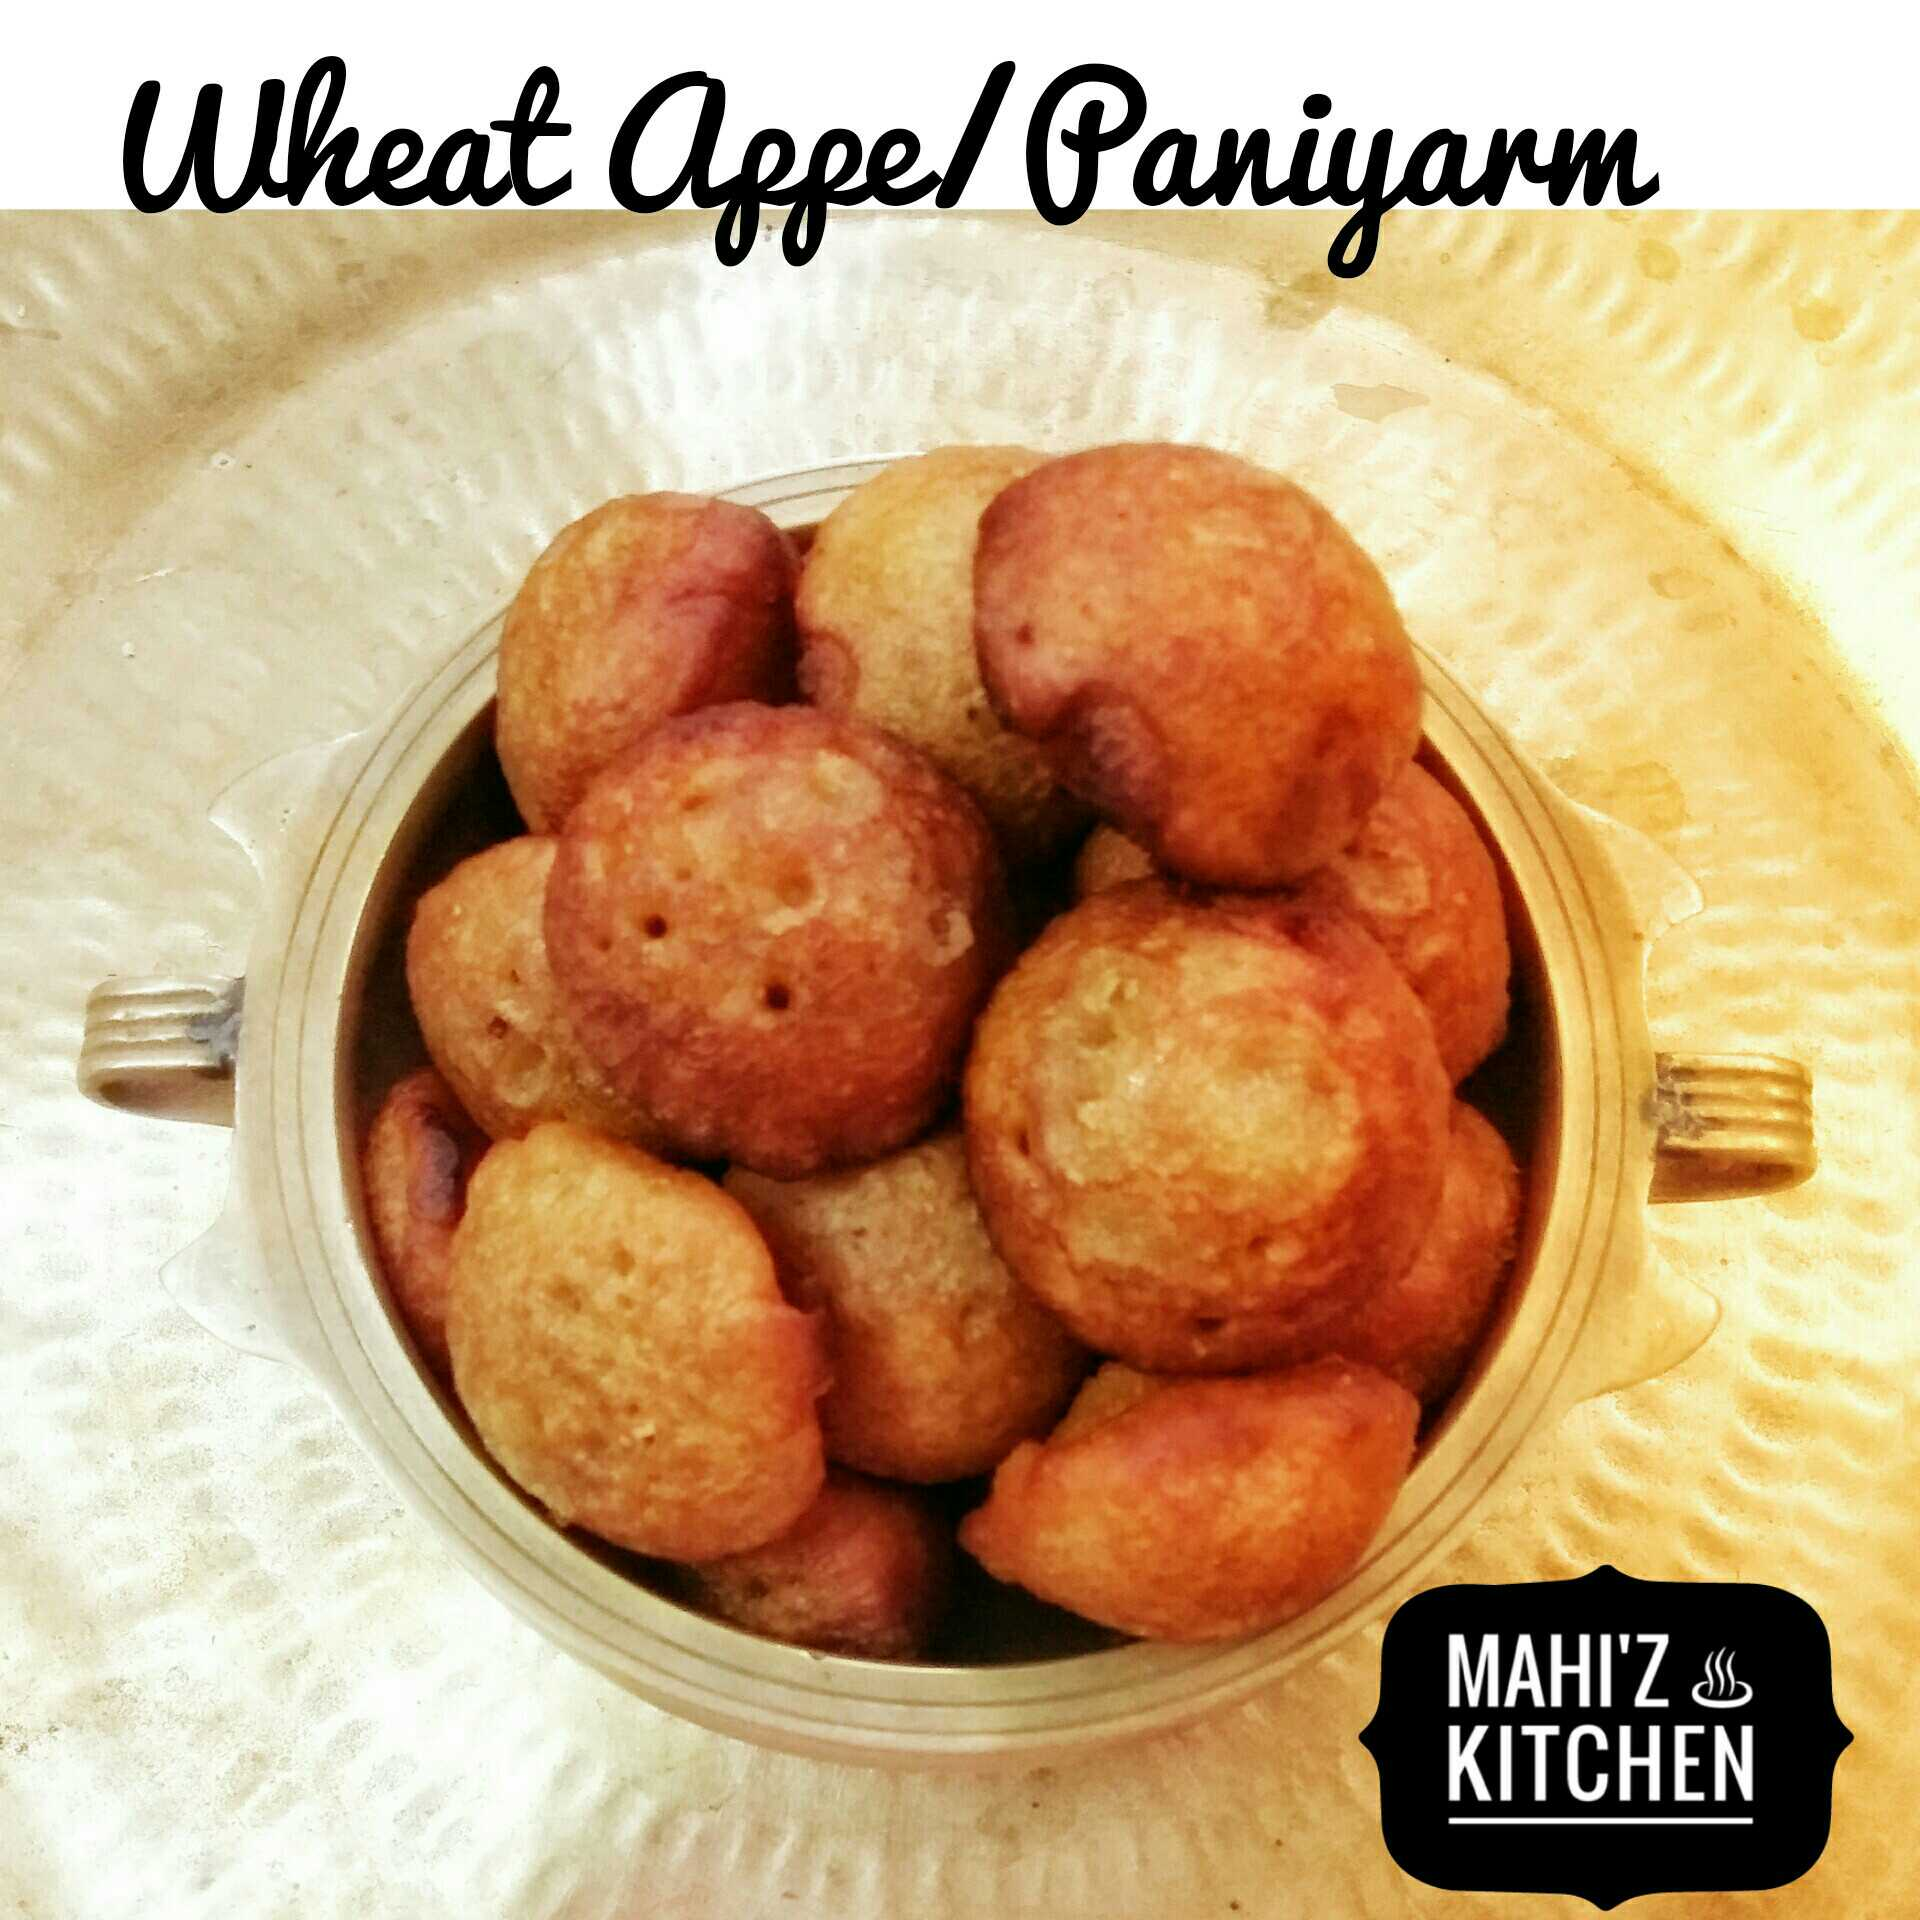 Wheat Appe